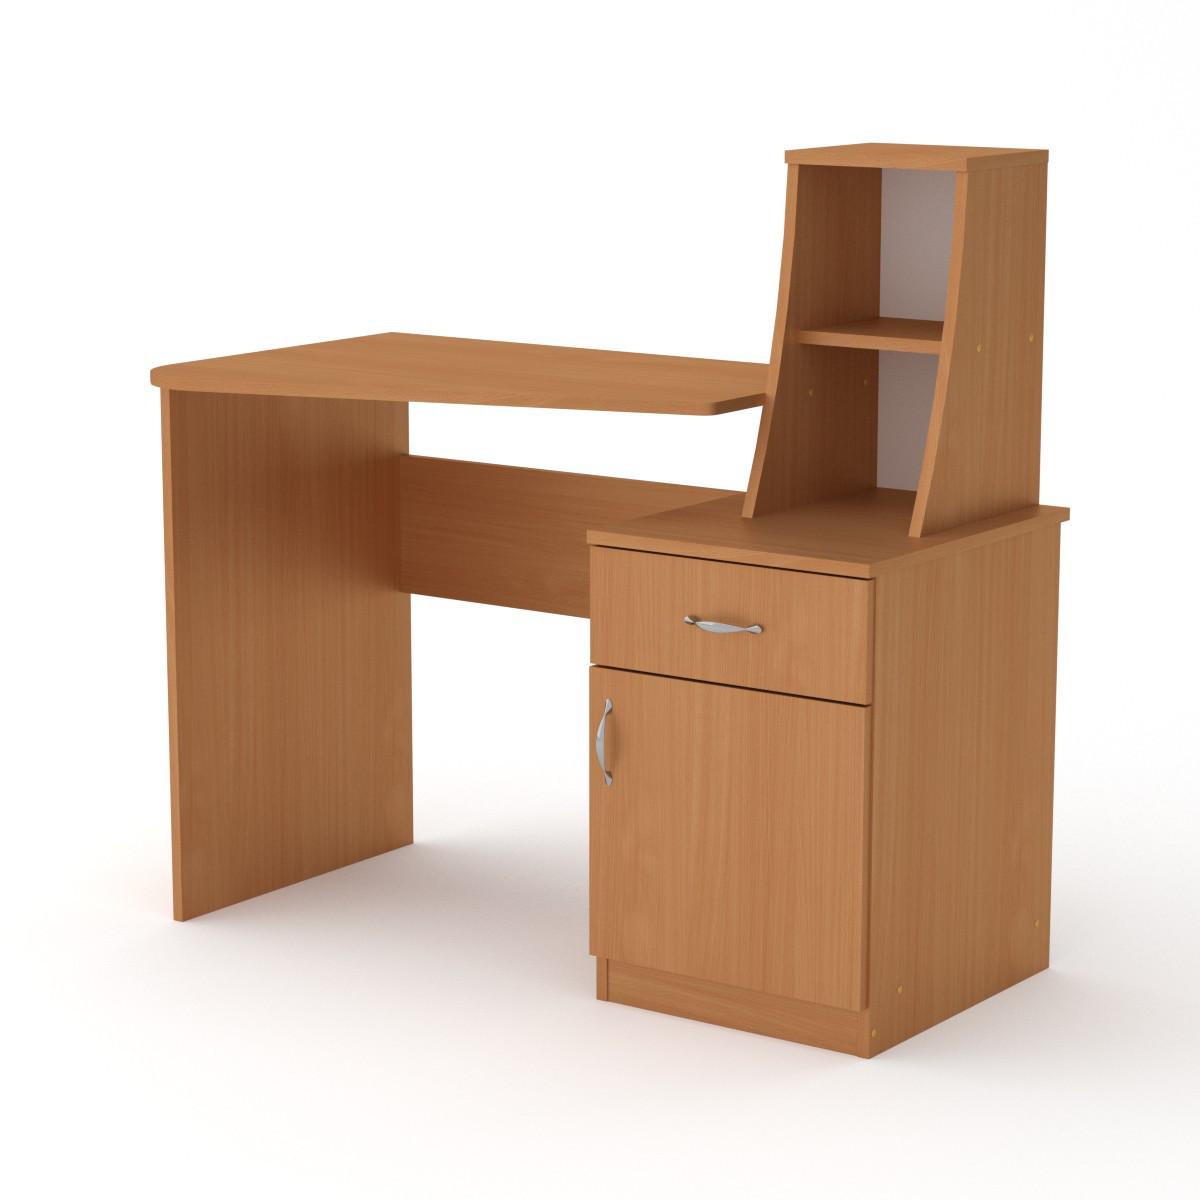 Письменный стол Компанит Школьник-3  1100х750+298х570 мм